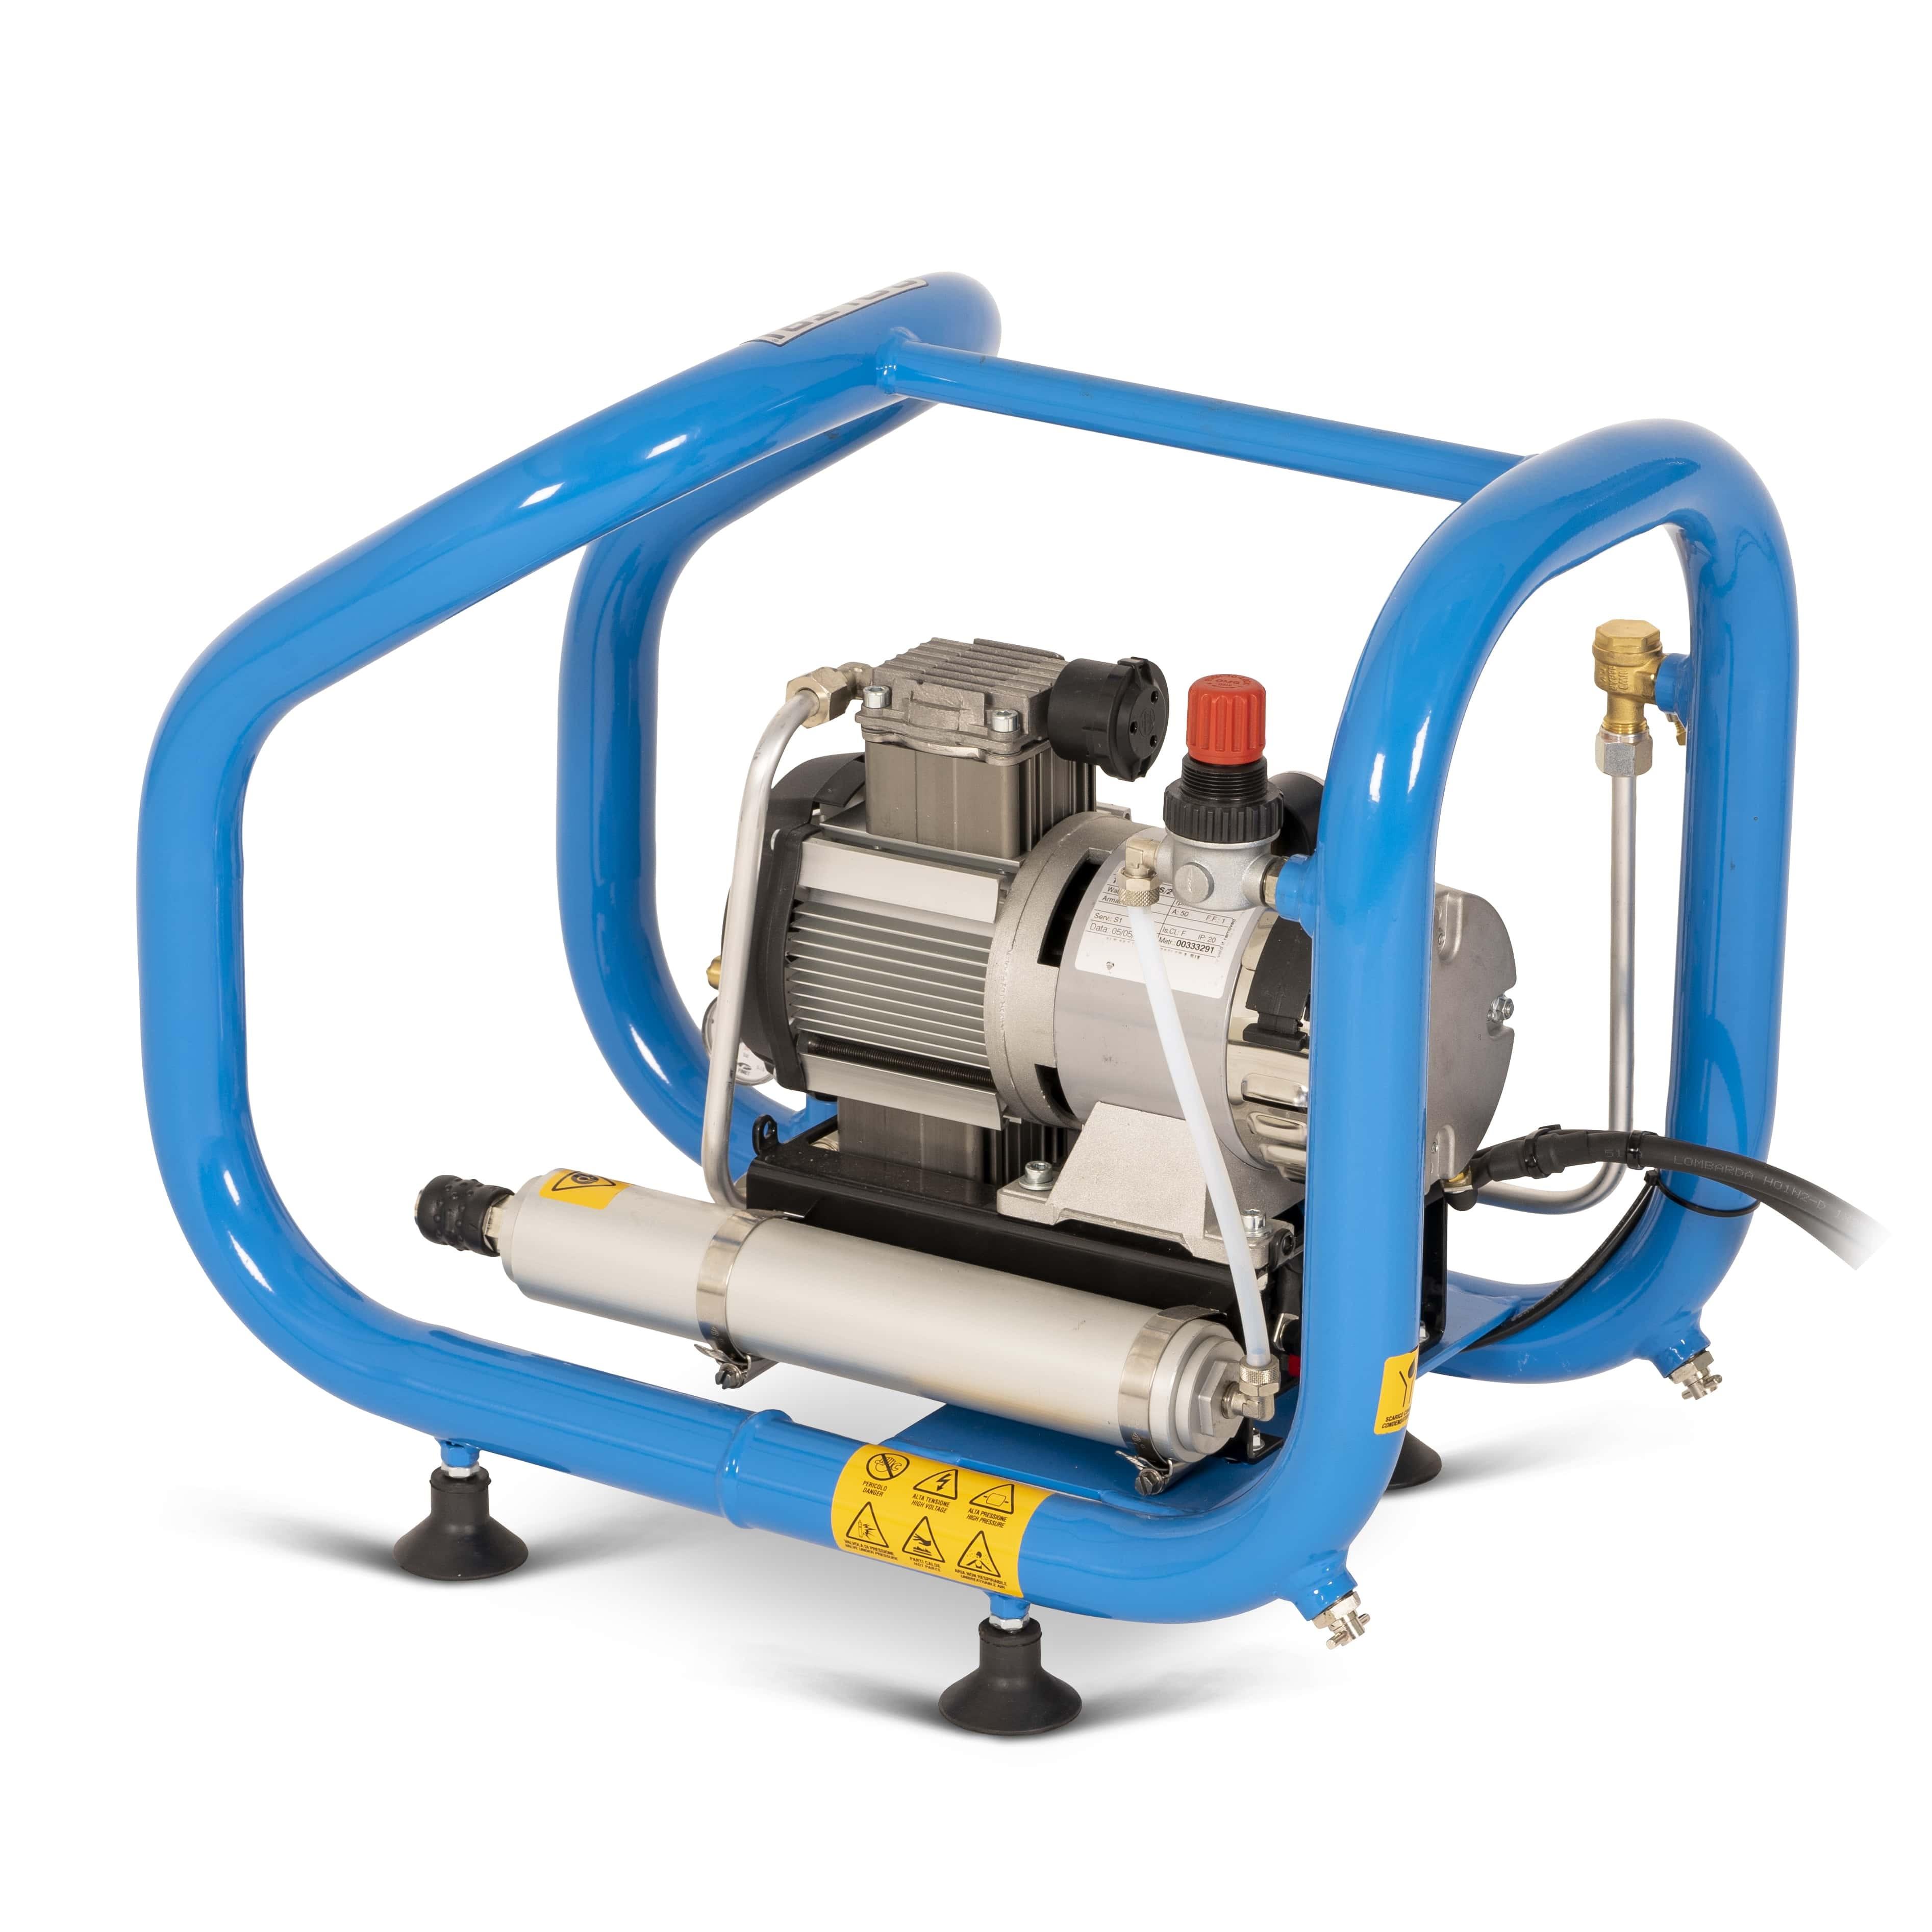 Coltri Teseo Third Lung Portable Compressor